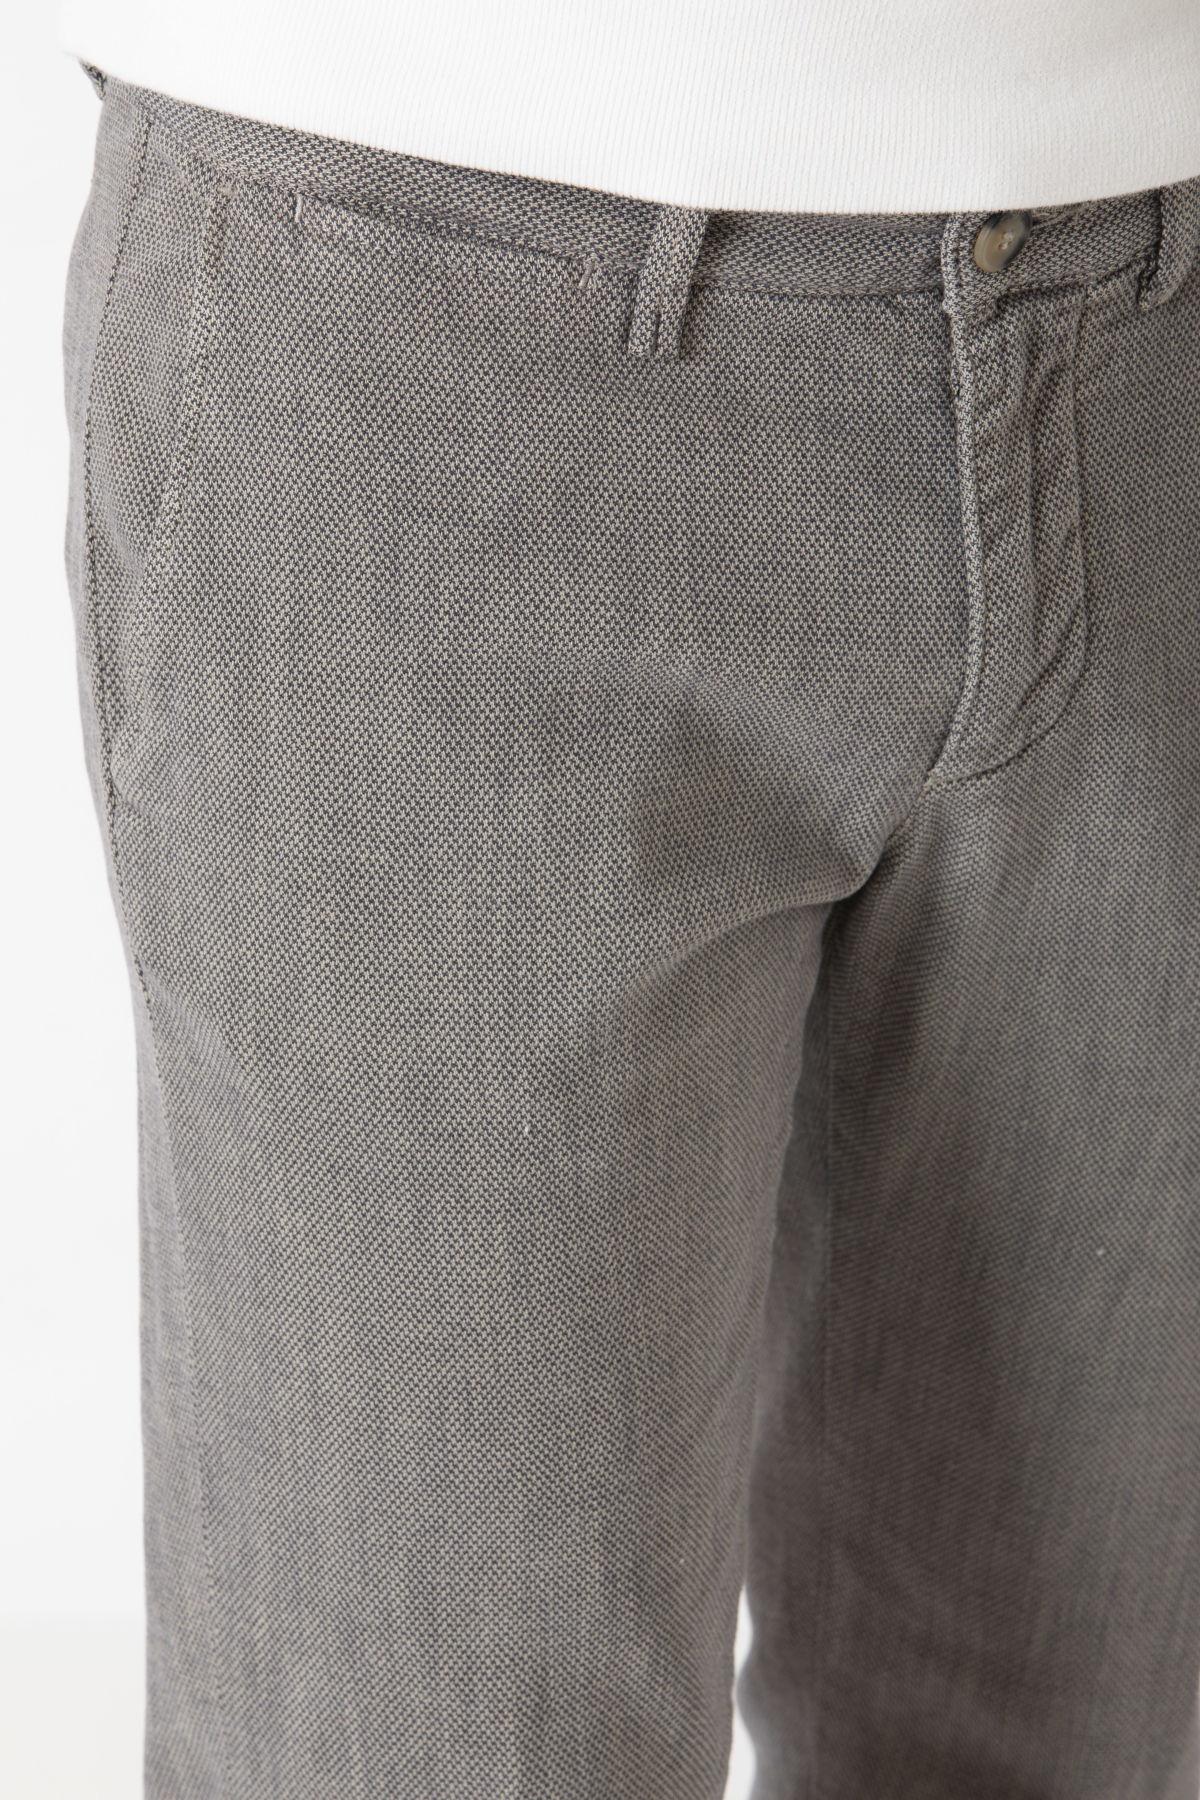 Pantaloni per uomo JECKERSON A/I 19-20